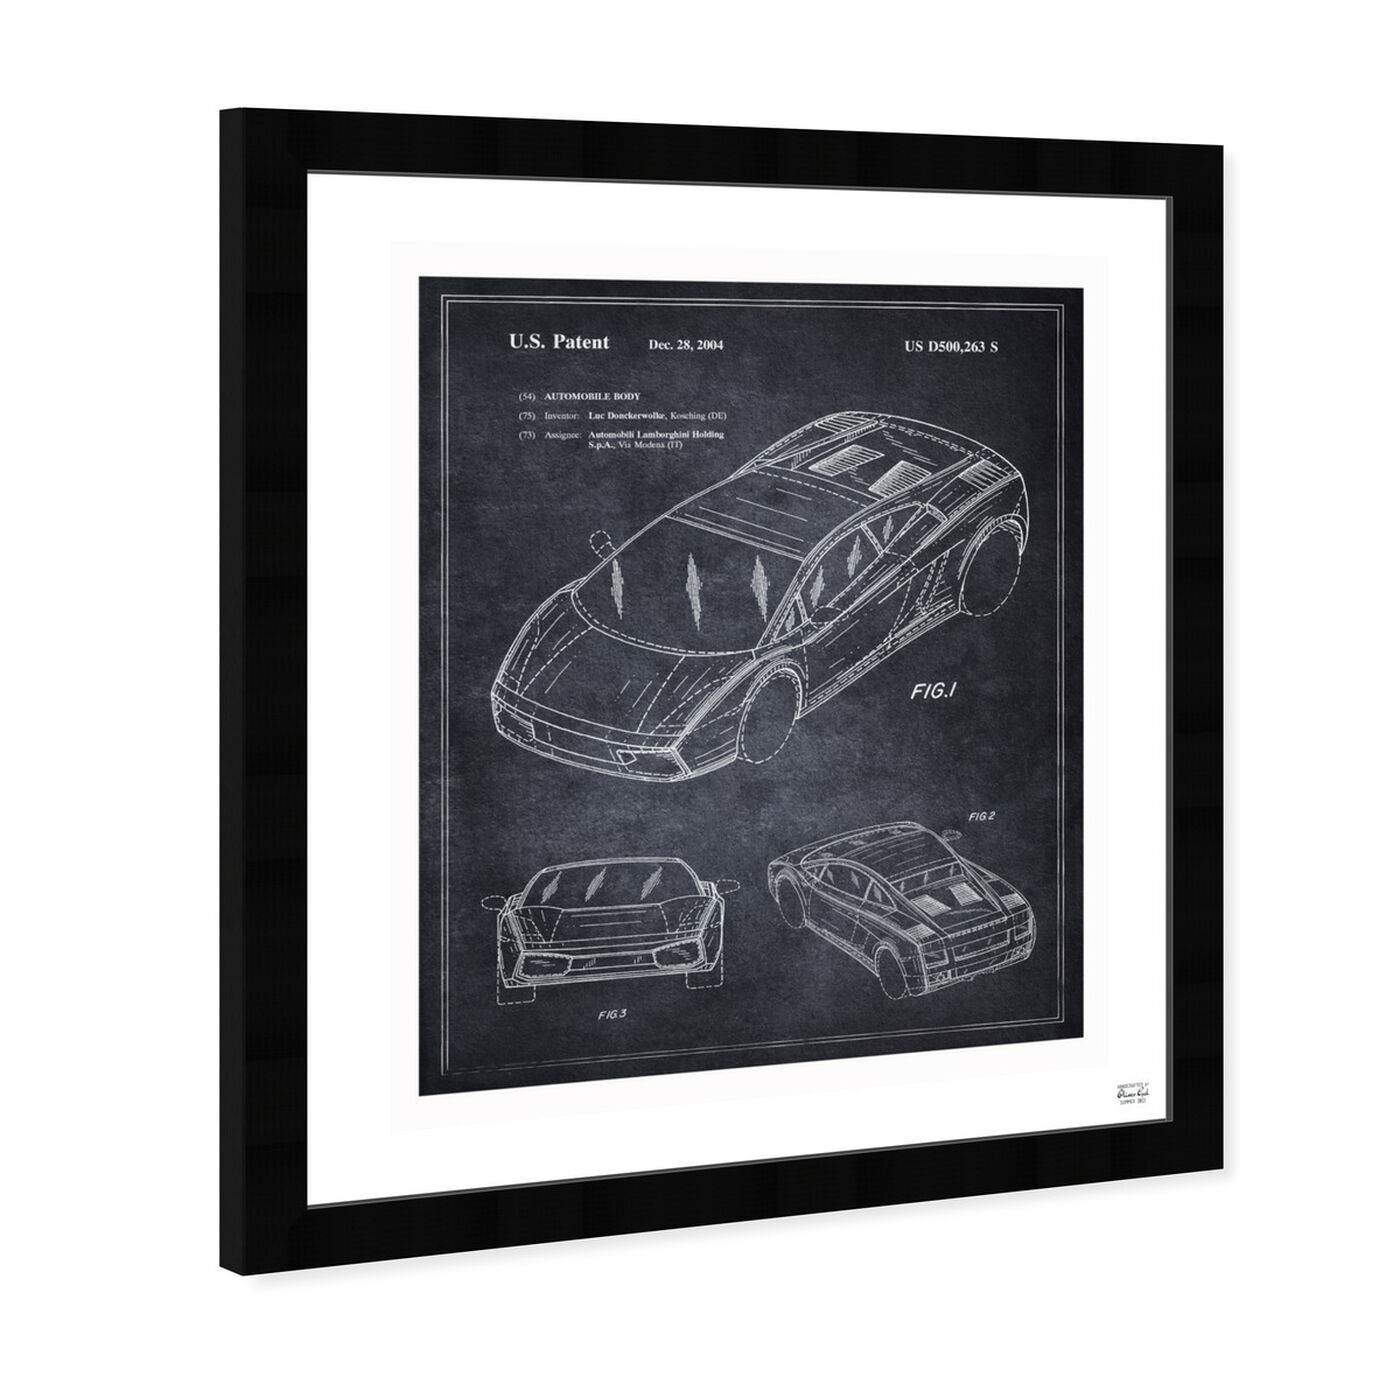 Angled view of Lamborghini Gallardo 2004 featuring transportation and automobiles art.